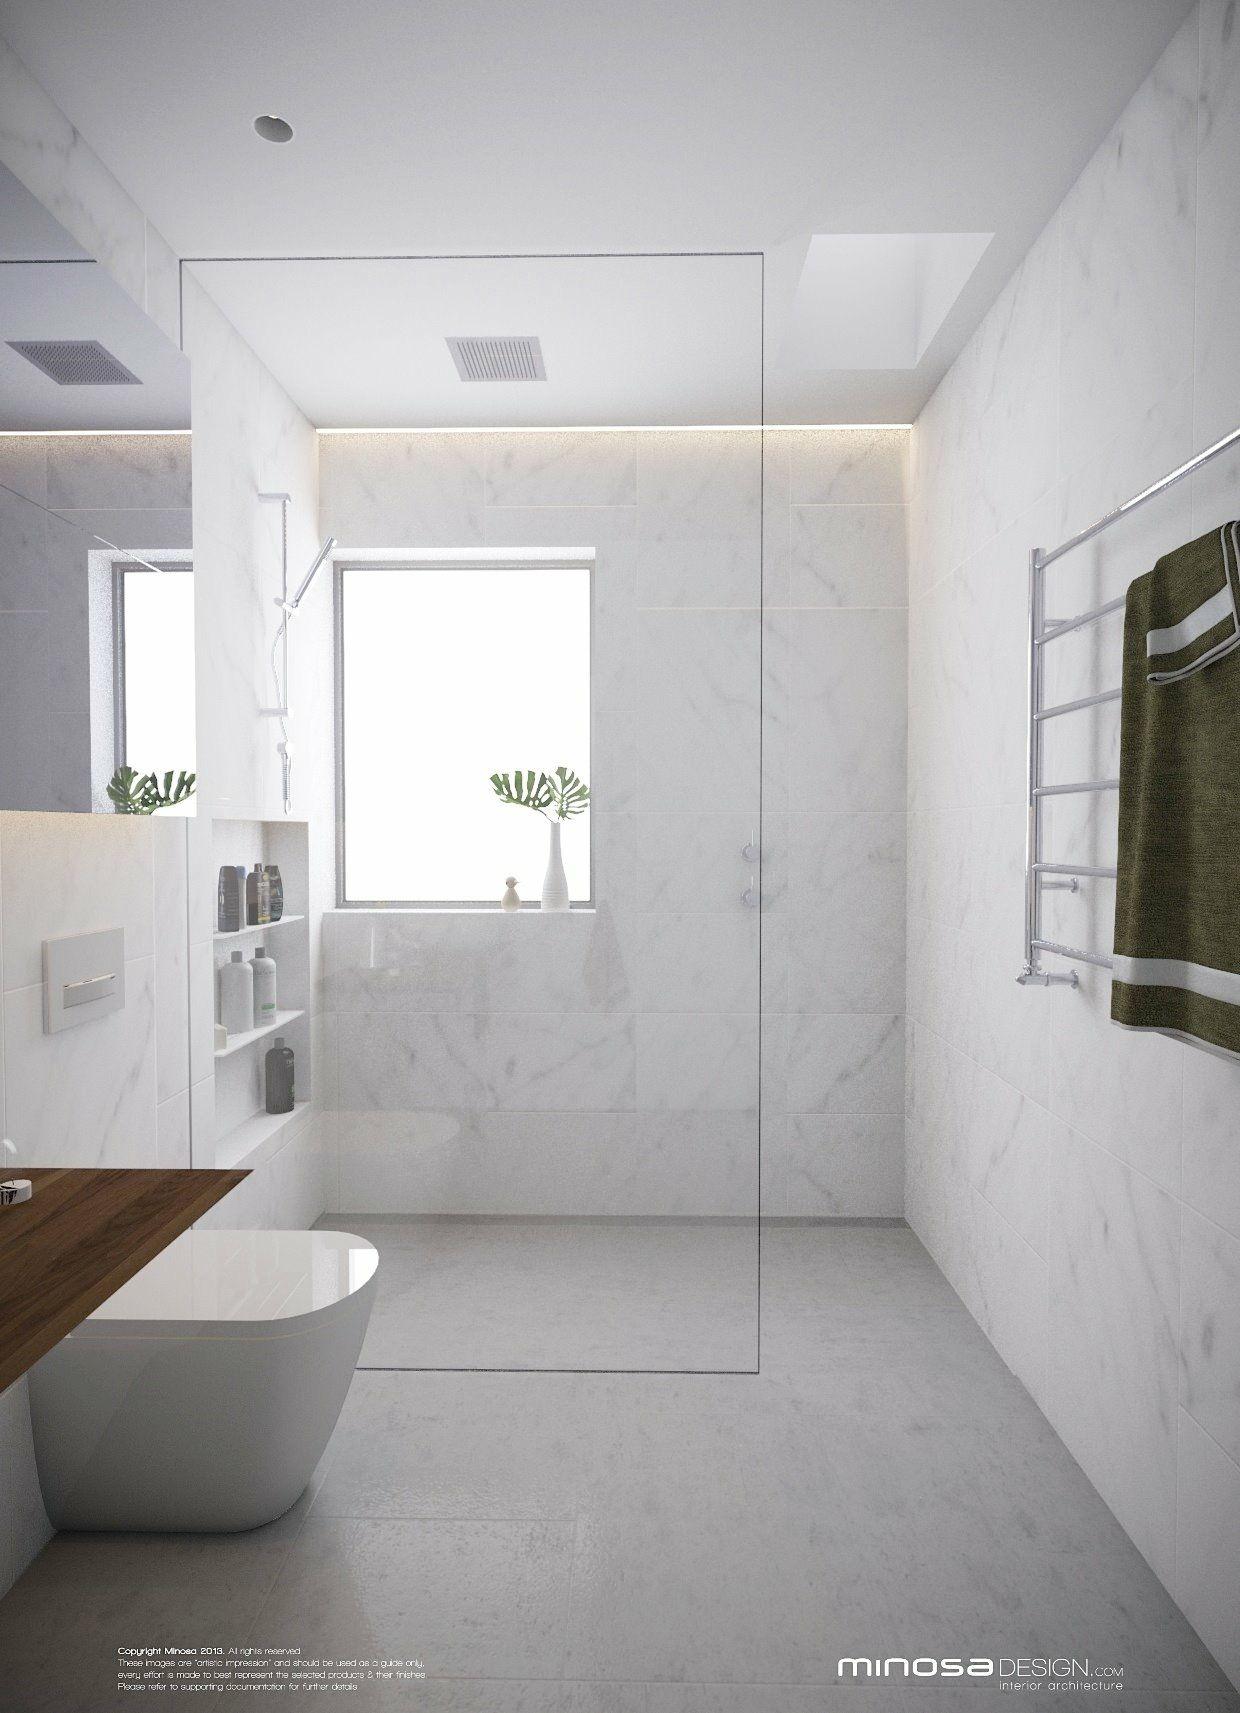 Pin by noortje van sambeek on another home pinterest bathroom